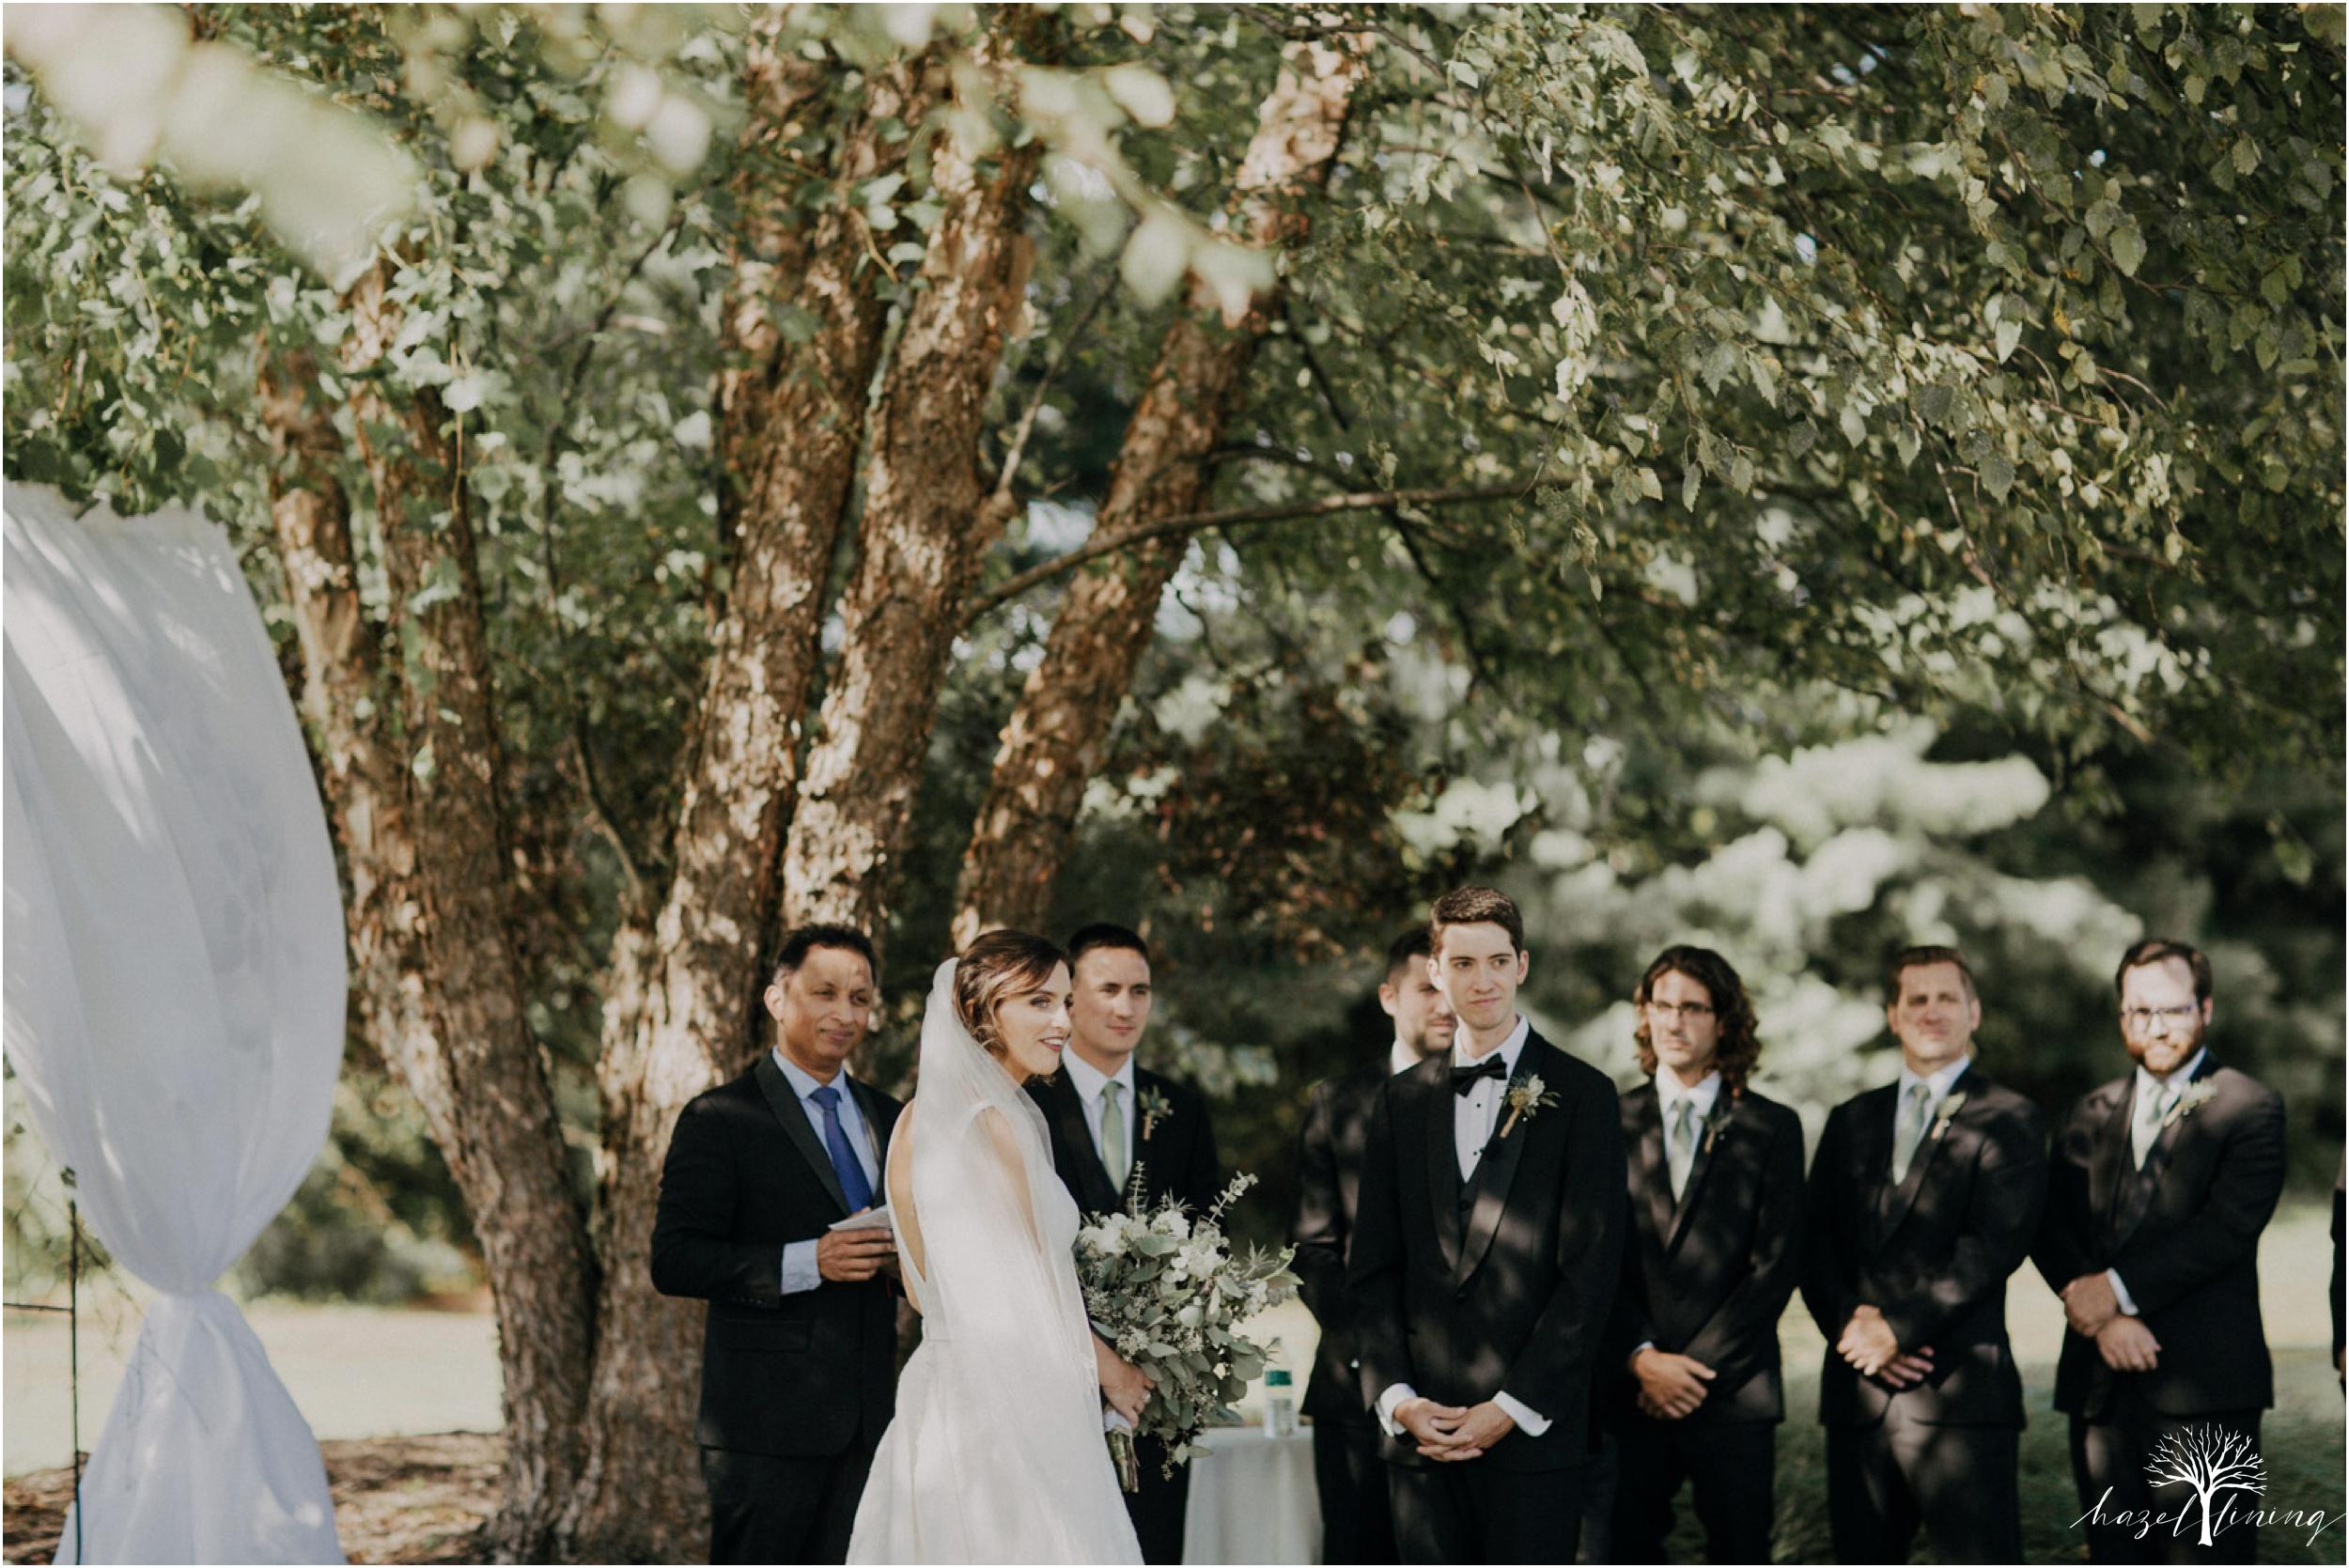 maureen-hepner-anthony-giordano-rose-bank-winery-newtow-pennsylvania-luxury-summer-wedding-hazel-lining-photography-destination-elopement-wedding-engagement-photography_0068.jpg